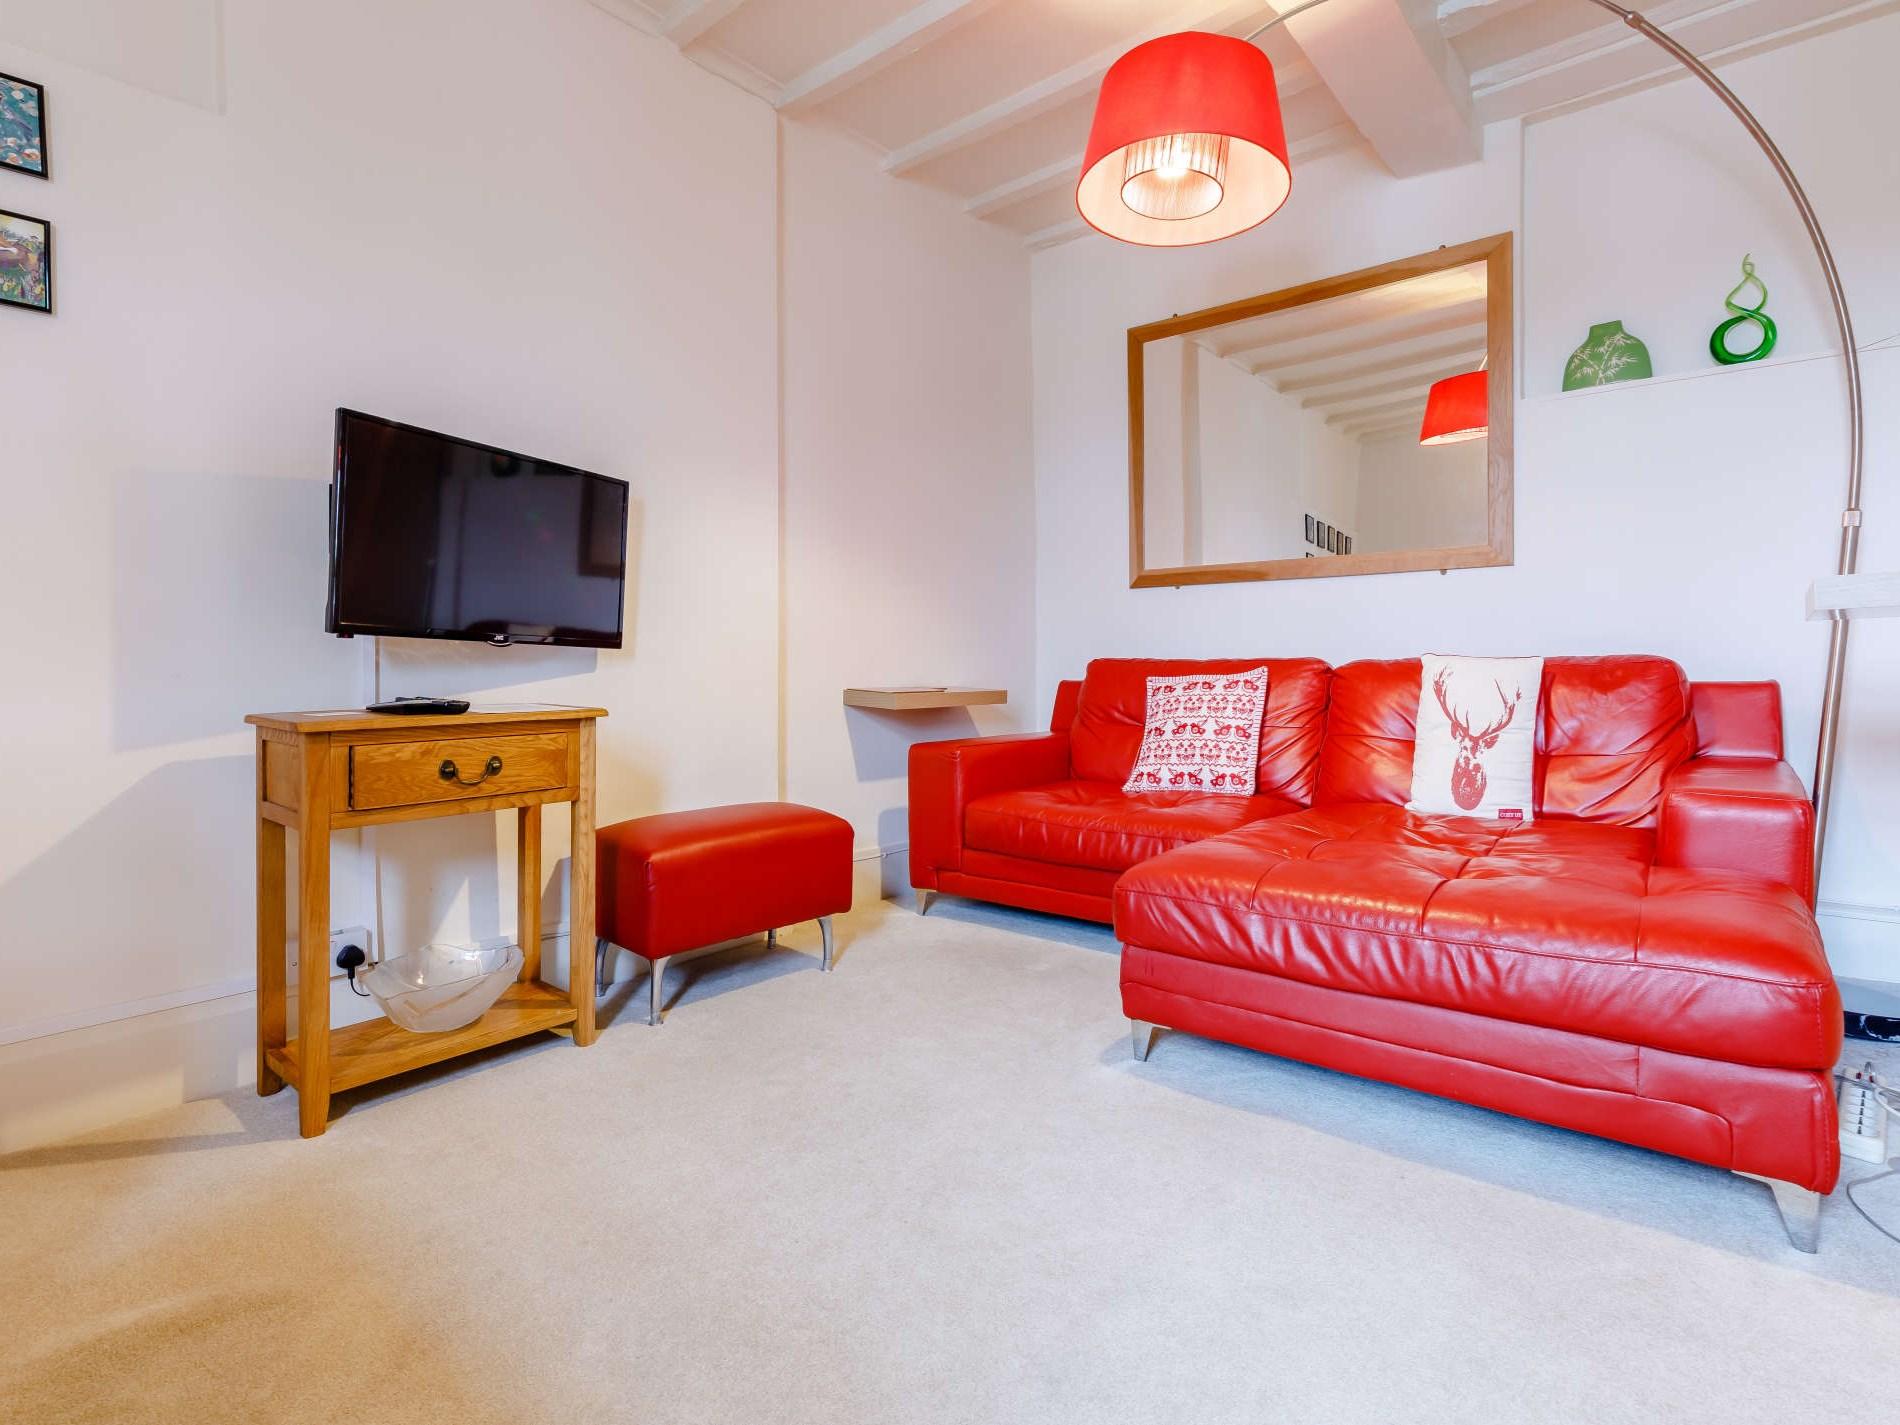 1 Bedroom Cottage in Kidderminster, Heart of England